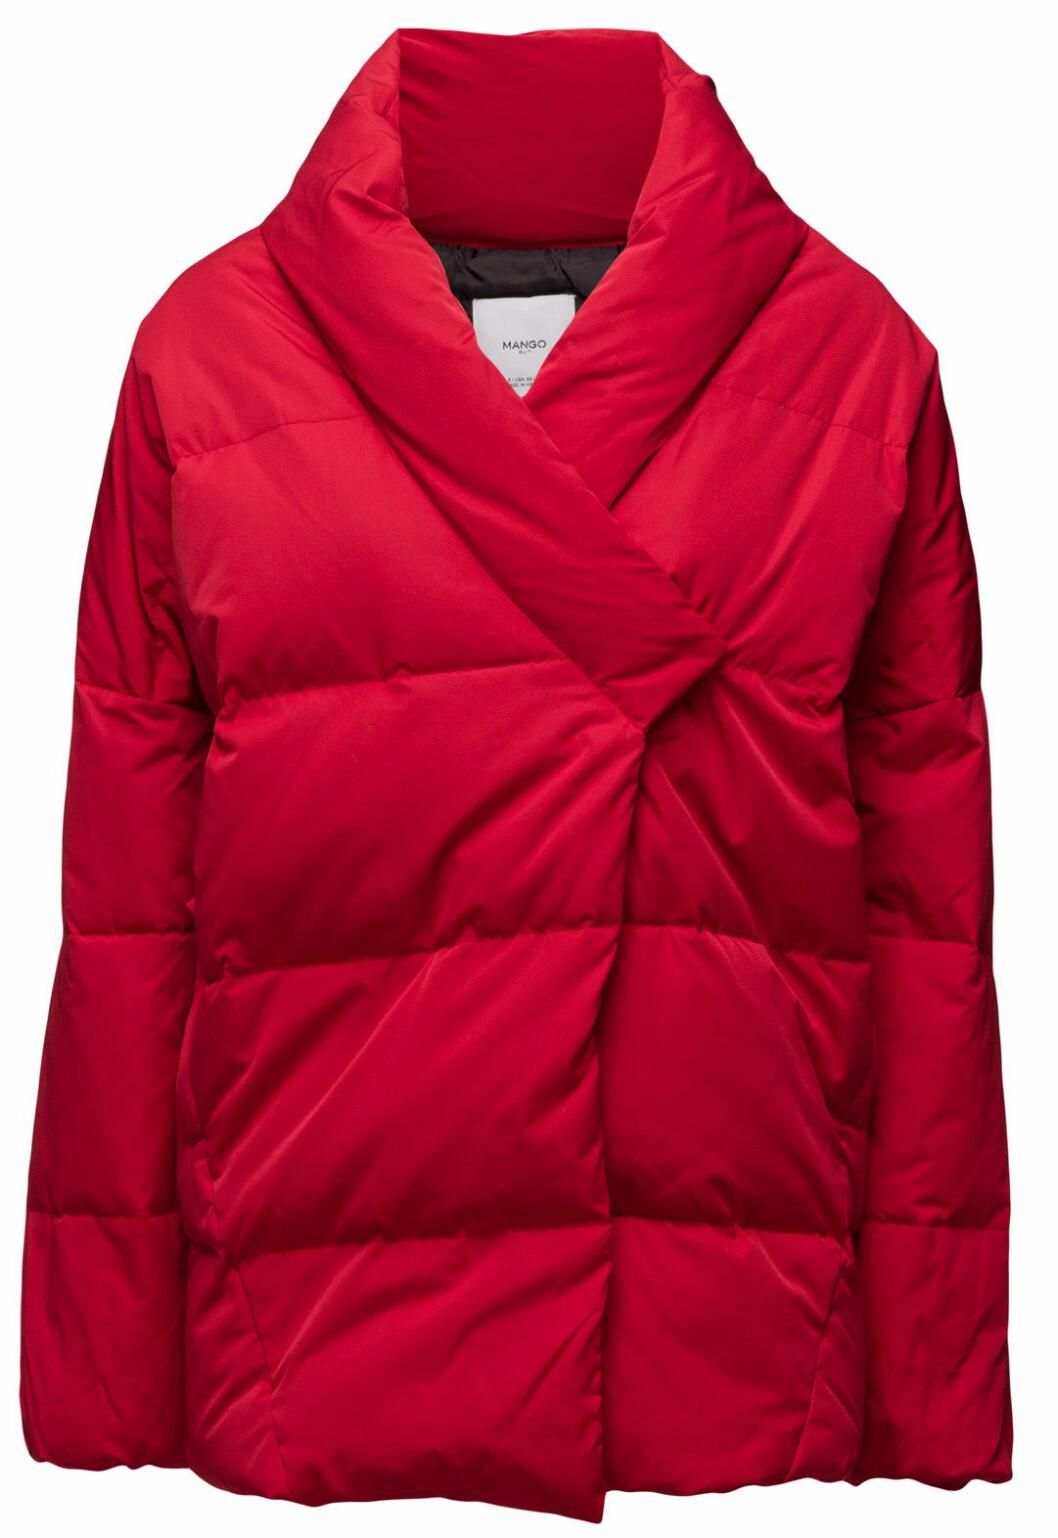 röd dunjacka vinter 2016